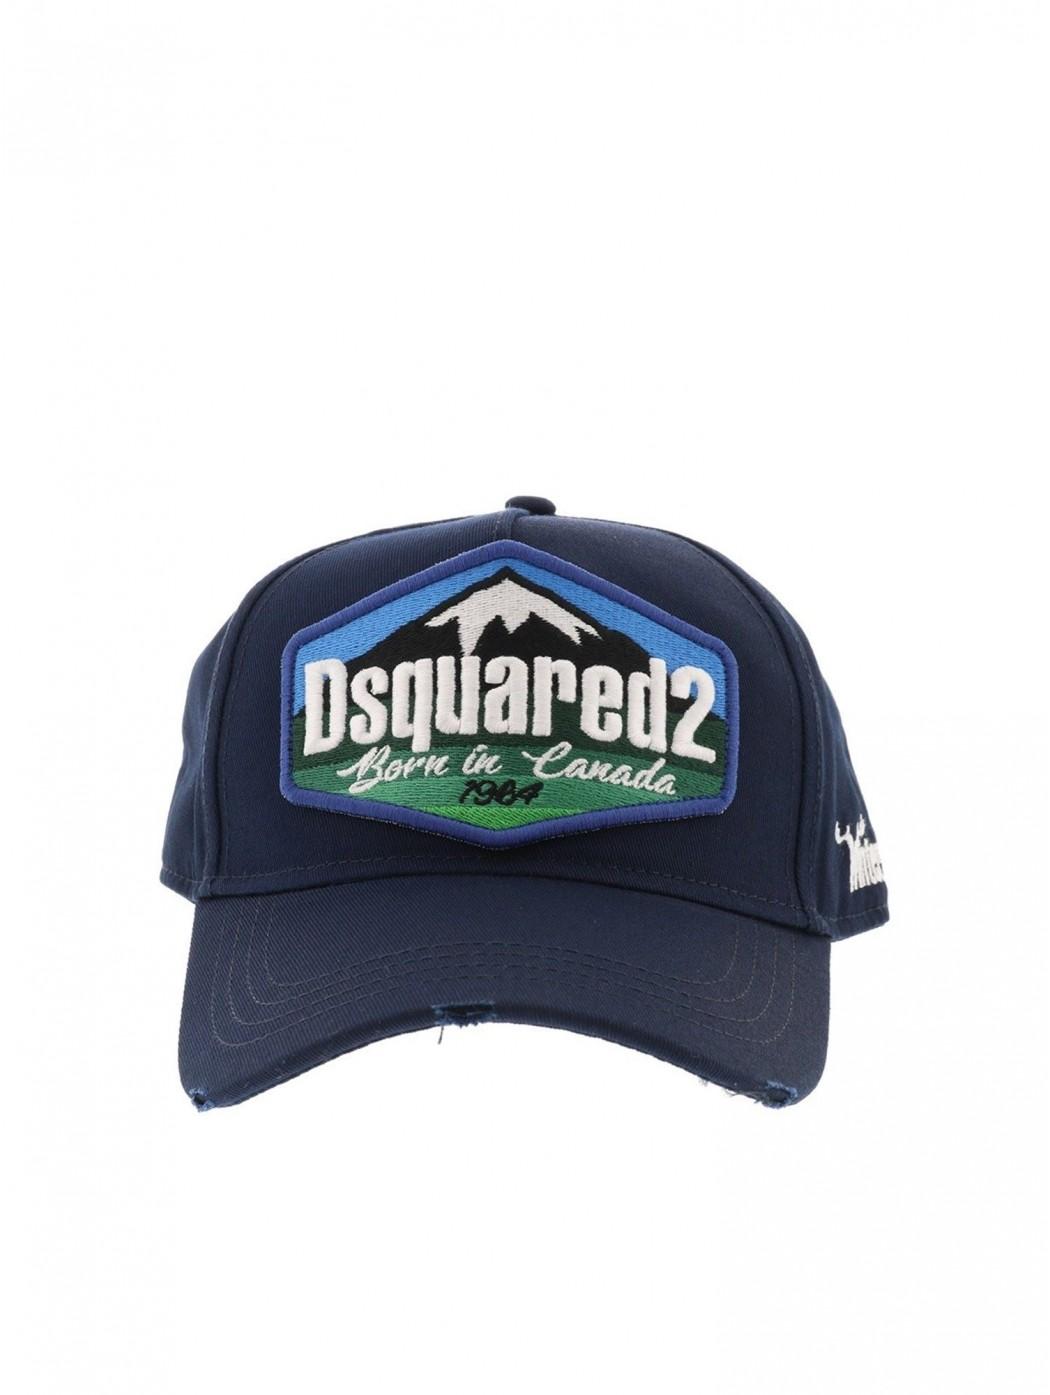 BASEBALL CAP DSQUARED2 BCM044805C00001 3073